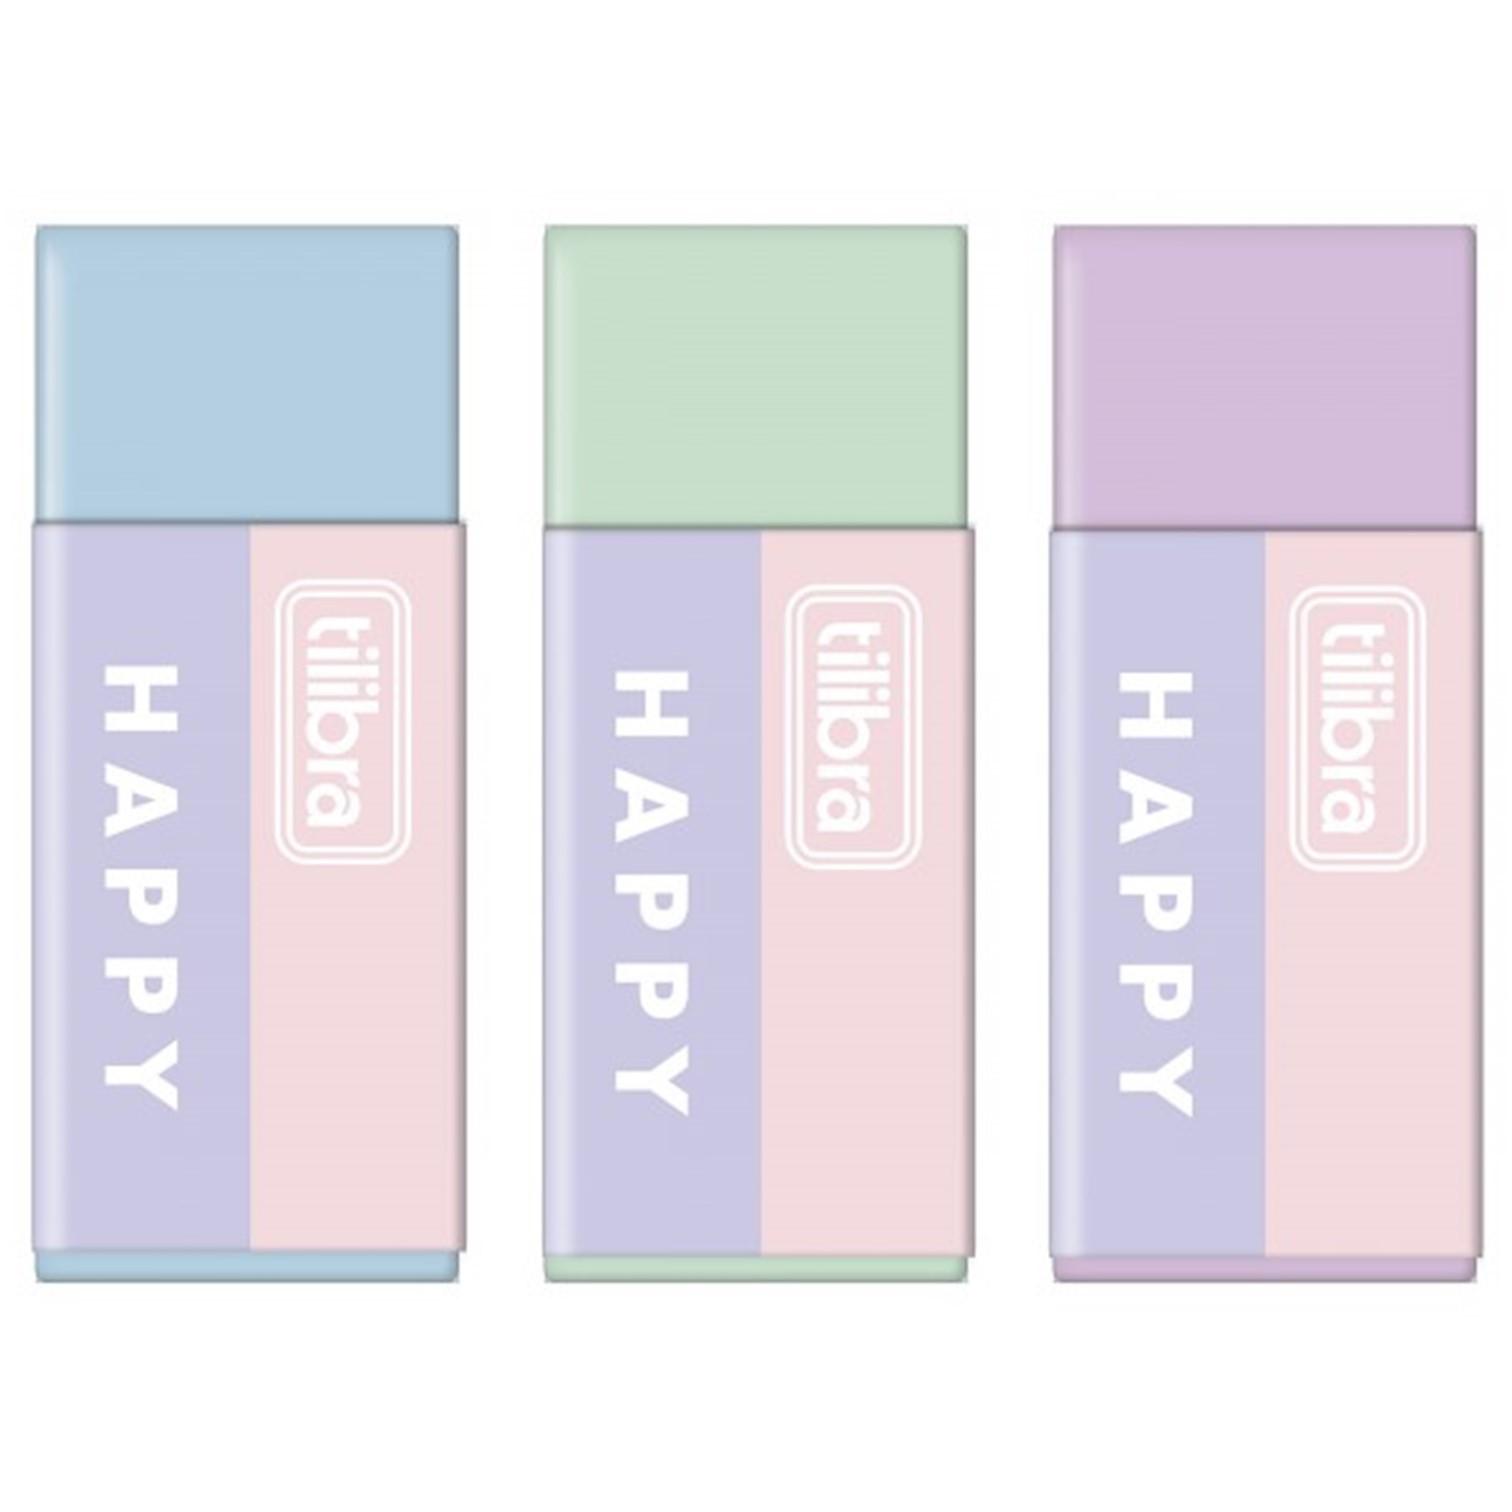 Borracha Tilibra Happy Pastel Cores - UN